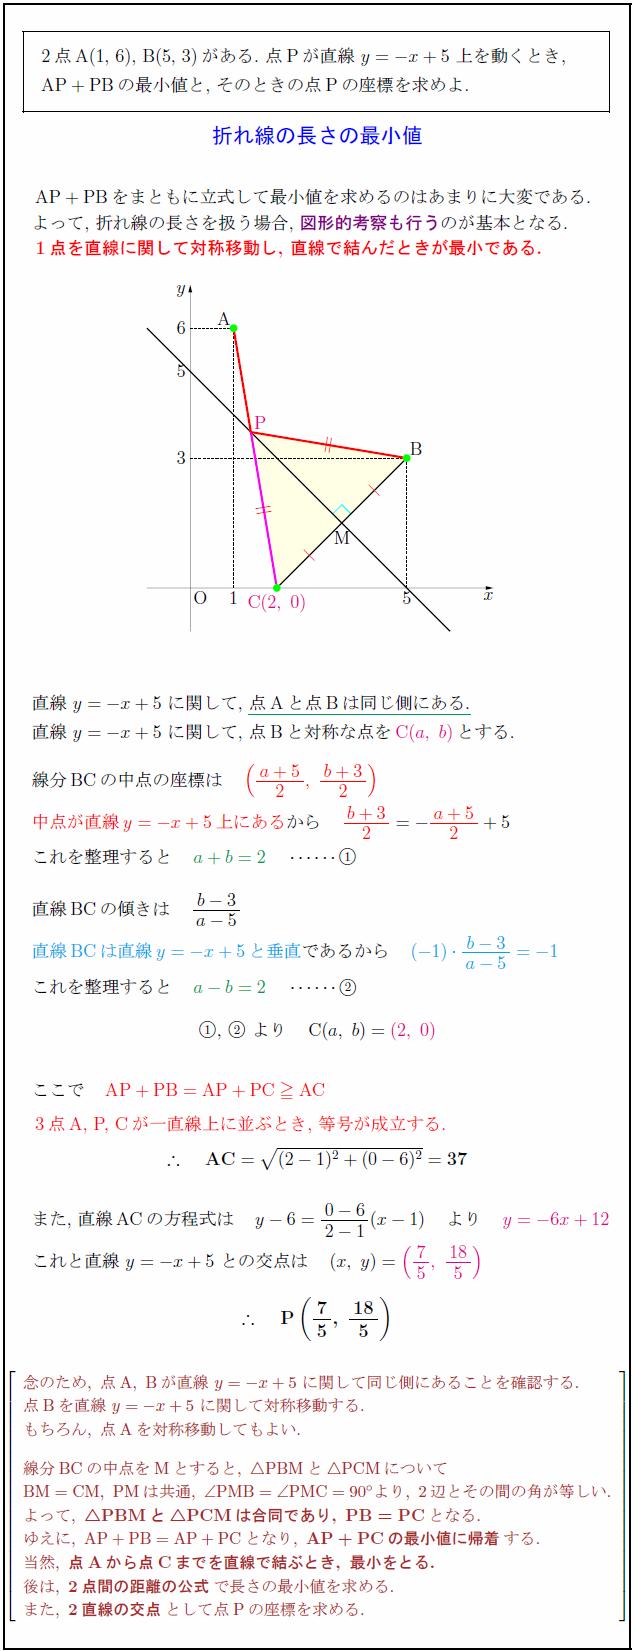 polygonal-line